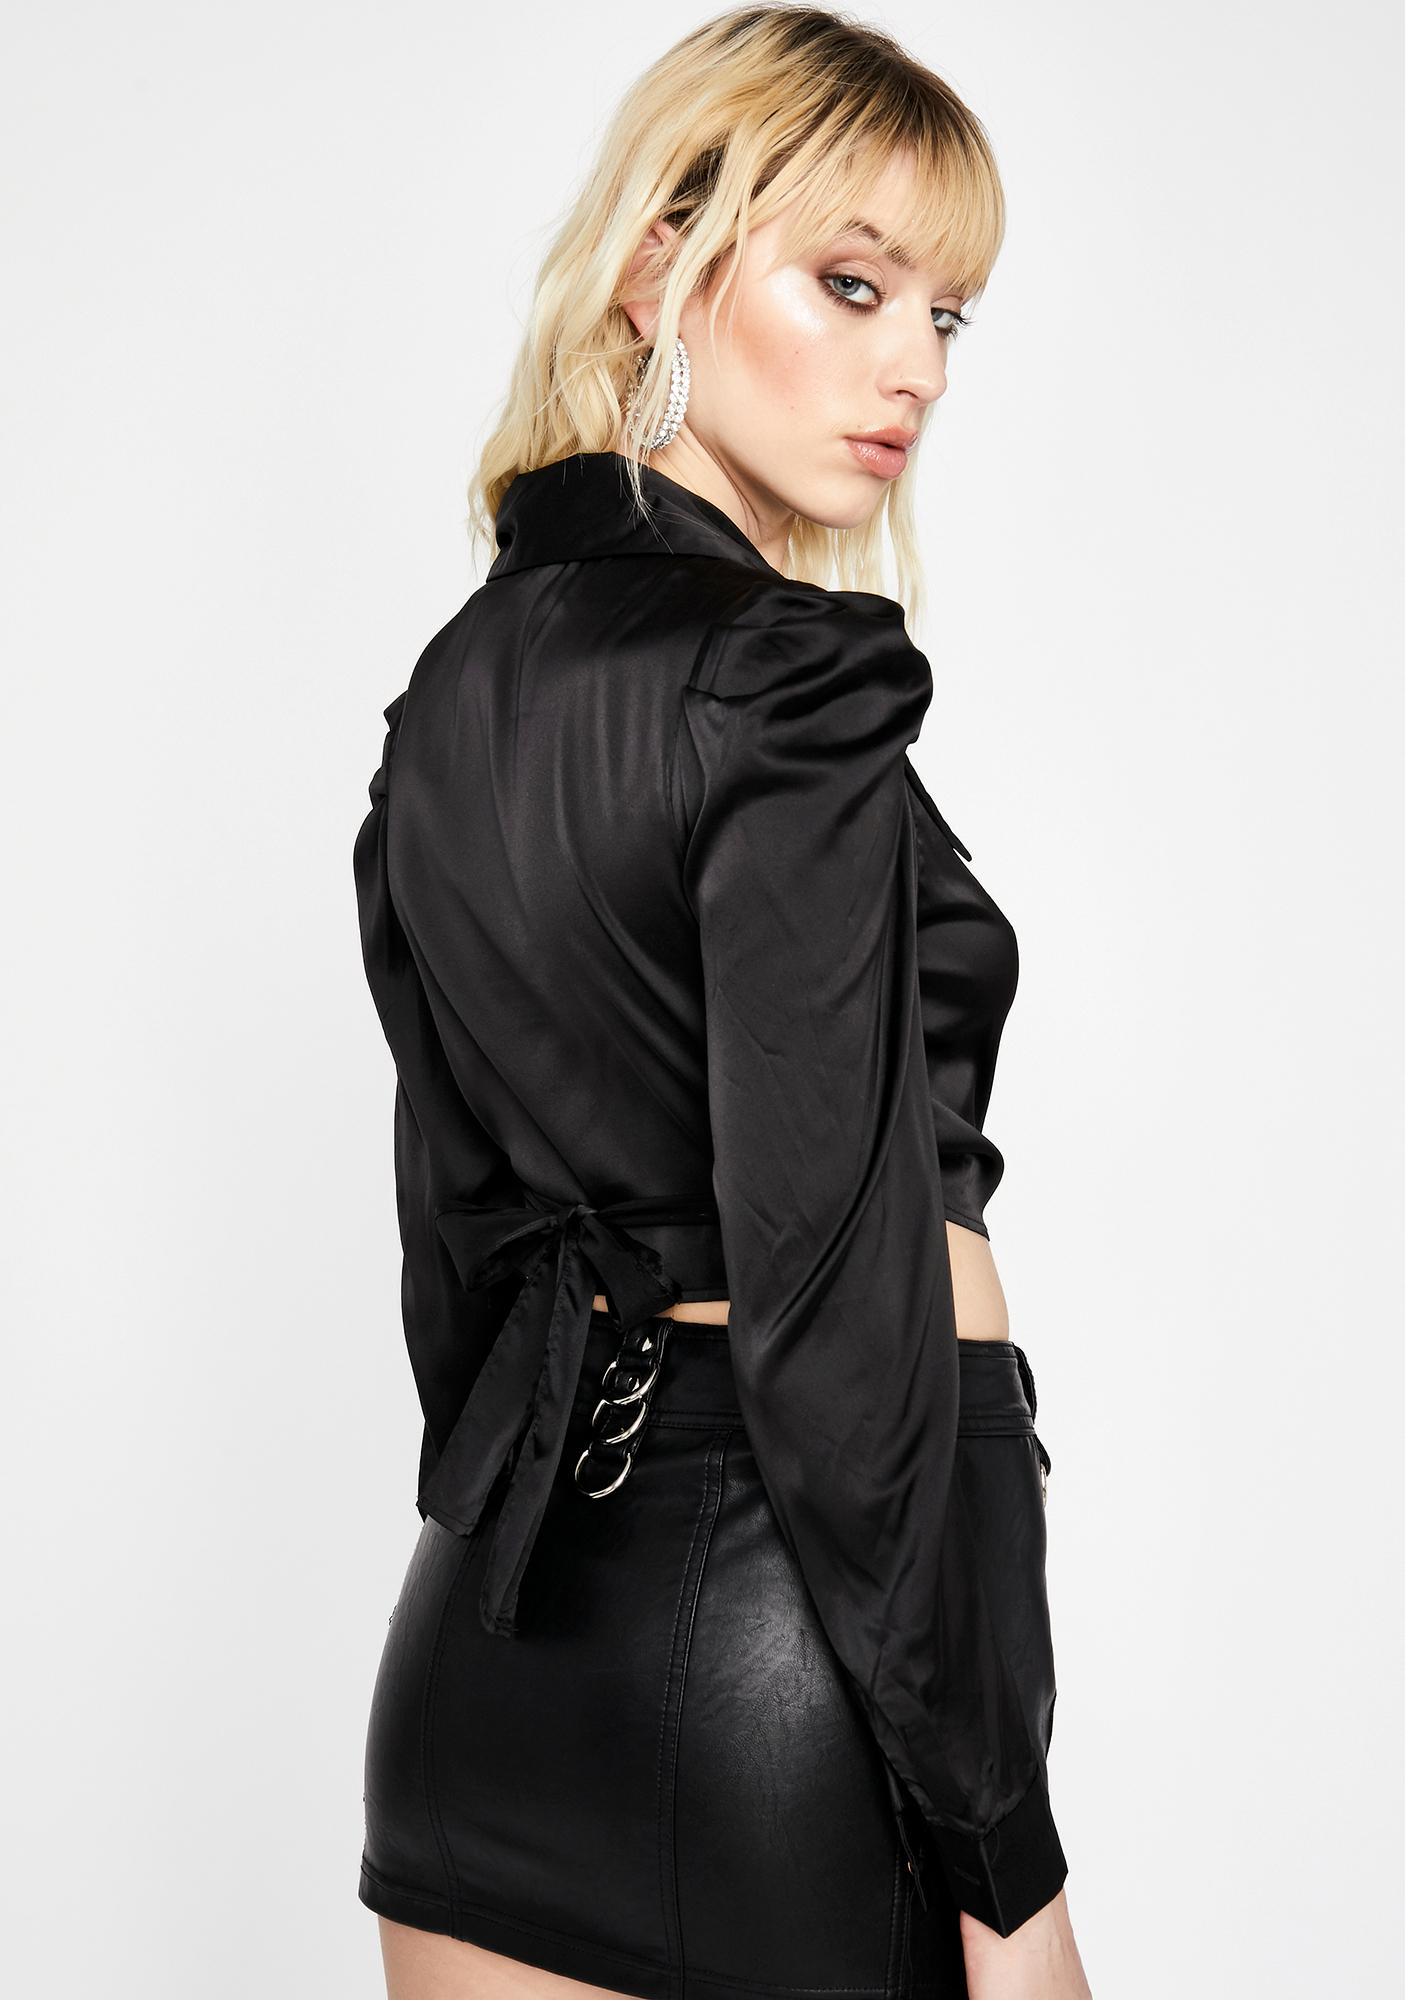 Blackout Tempered Lux Satin Shirt